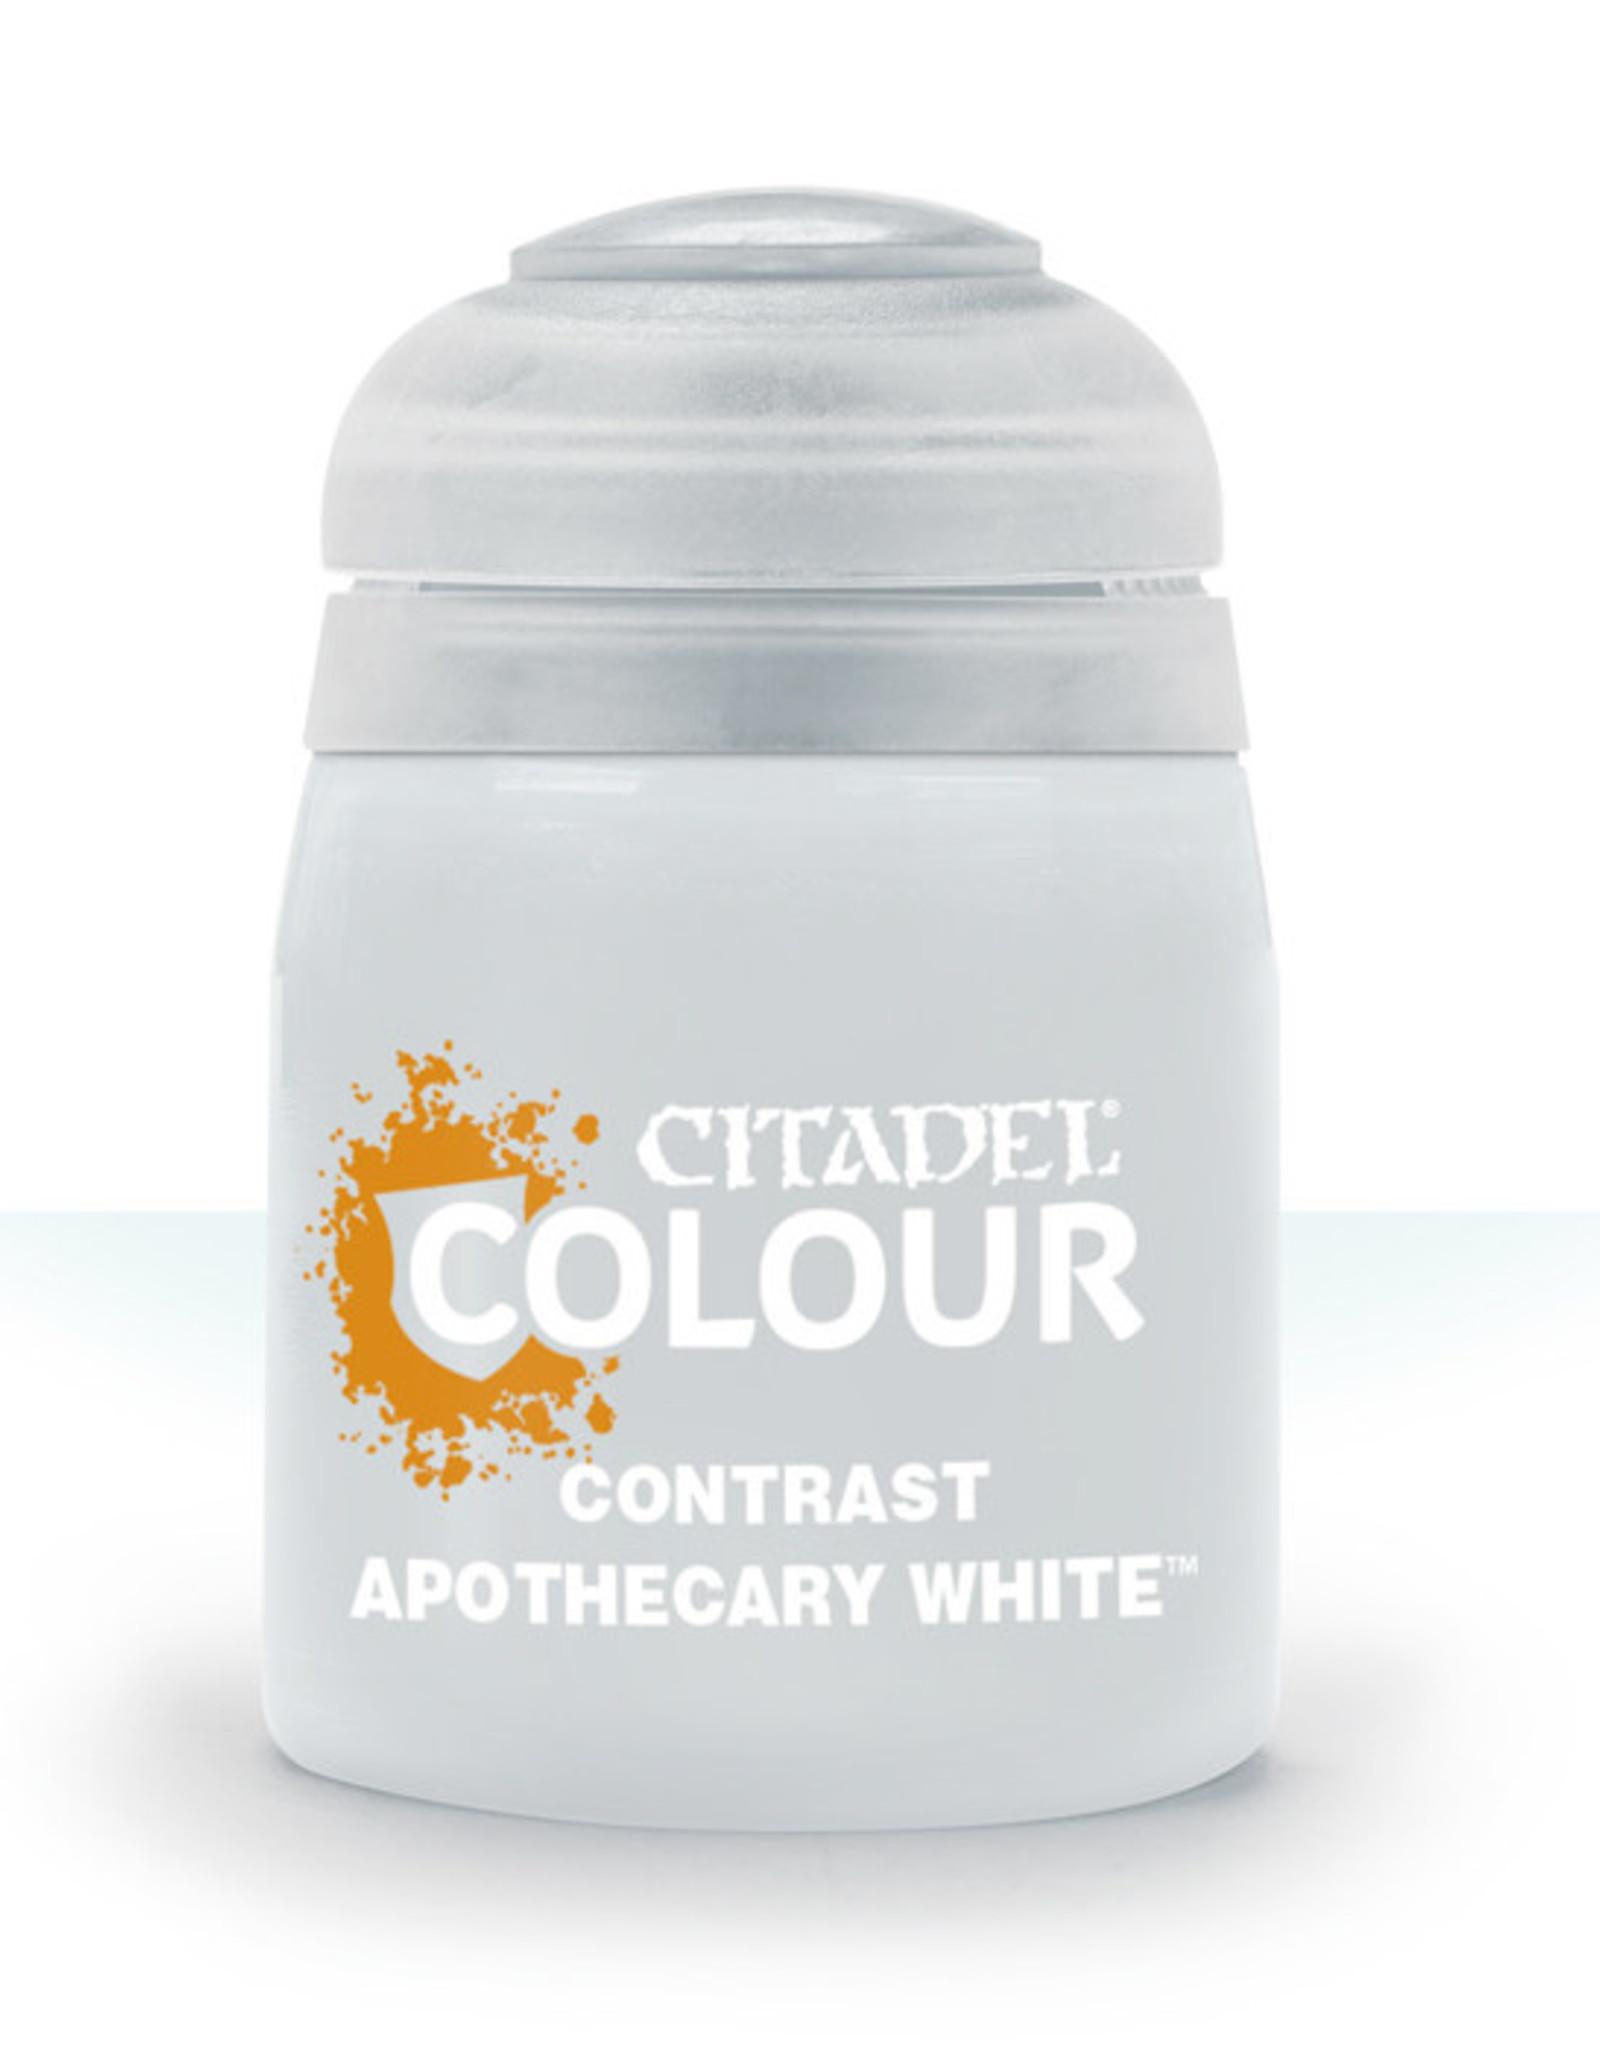 Citadel Citadel Colour: Contrast - Apothecary White